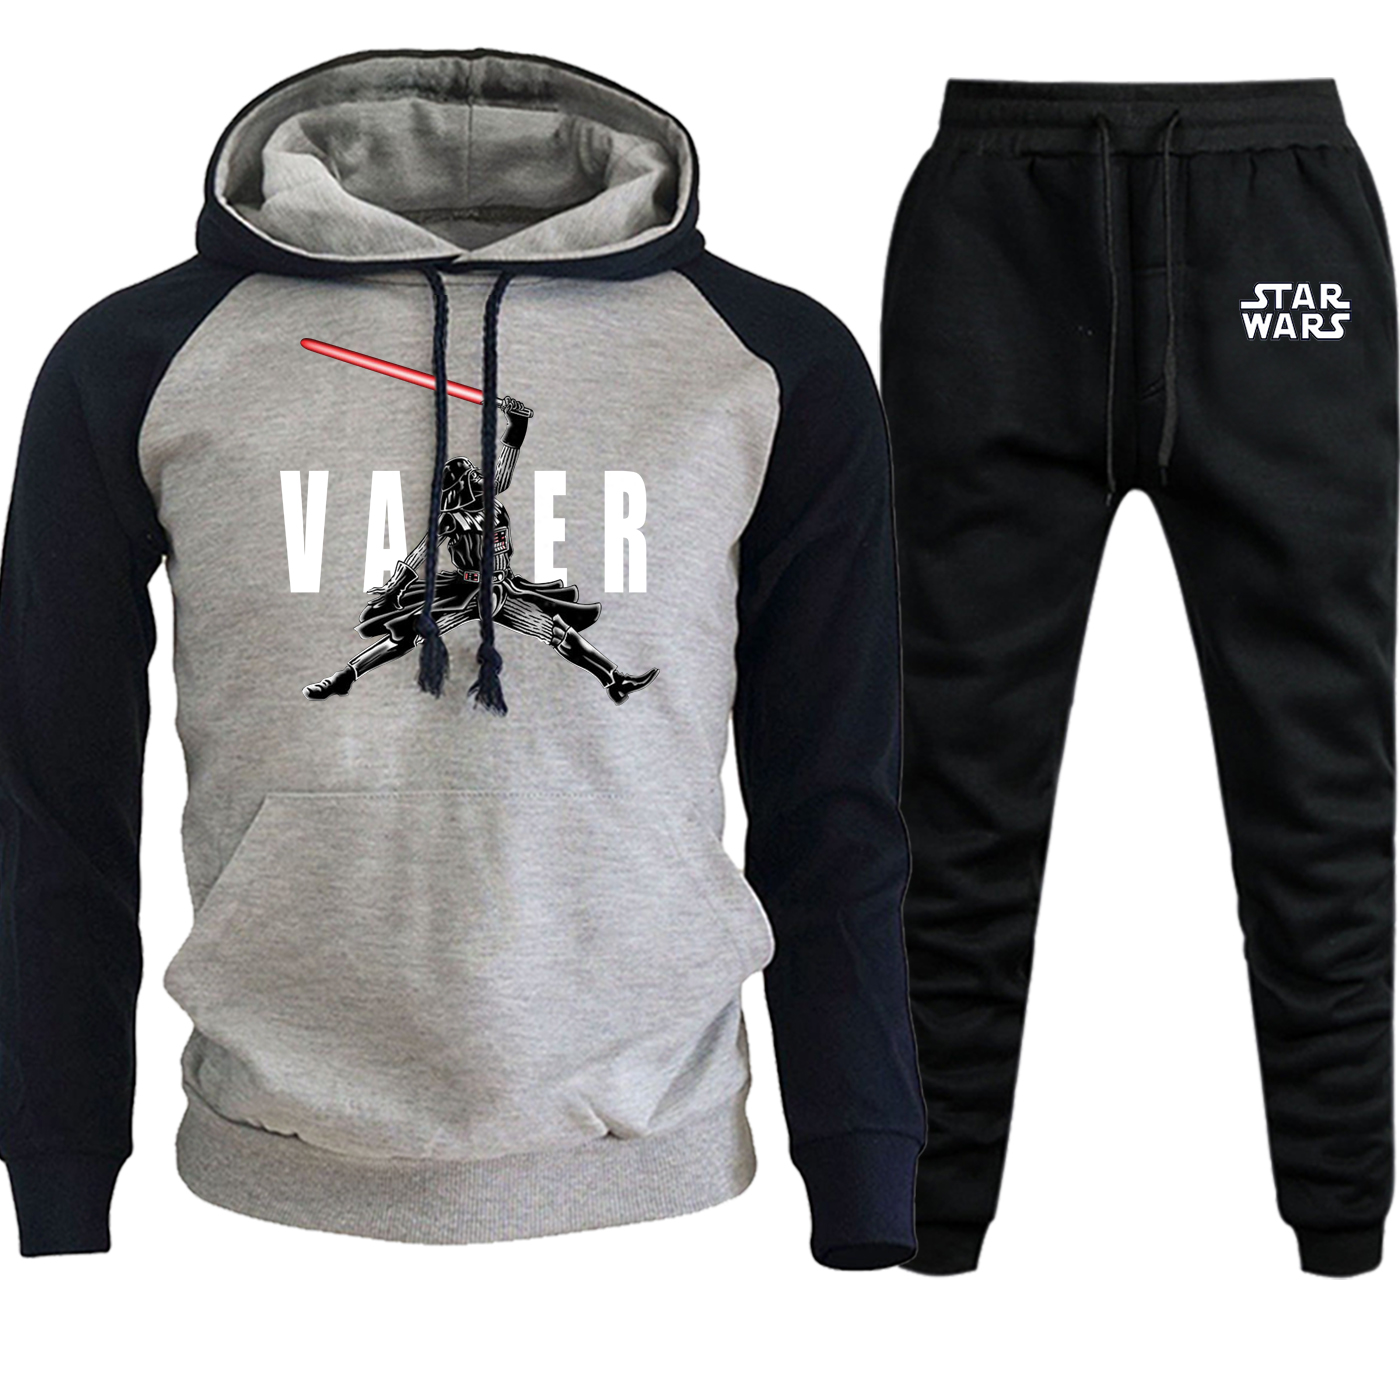 Darth Vader Star Wars Autumn Winter 2019 New Sportswear Hooded Men Raglan Suit Casual Fleece Hoodie Streetwear+Pants 2 Piece Set